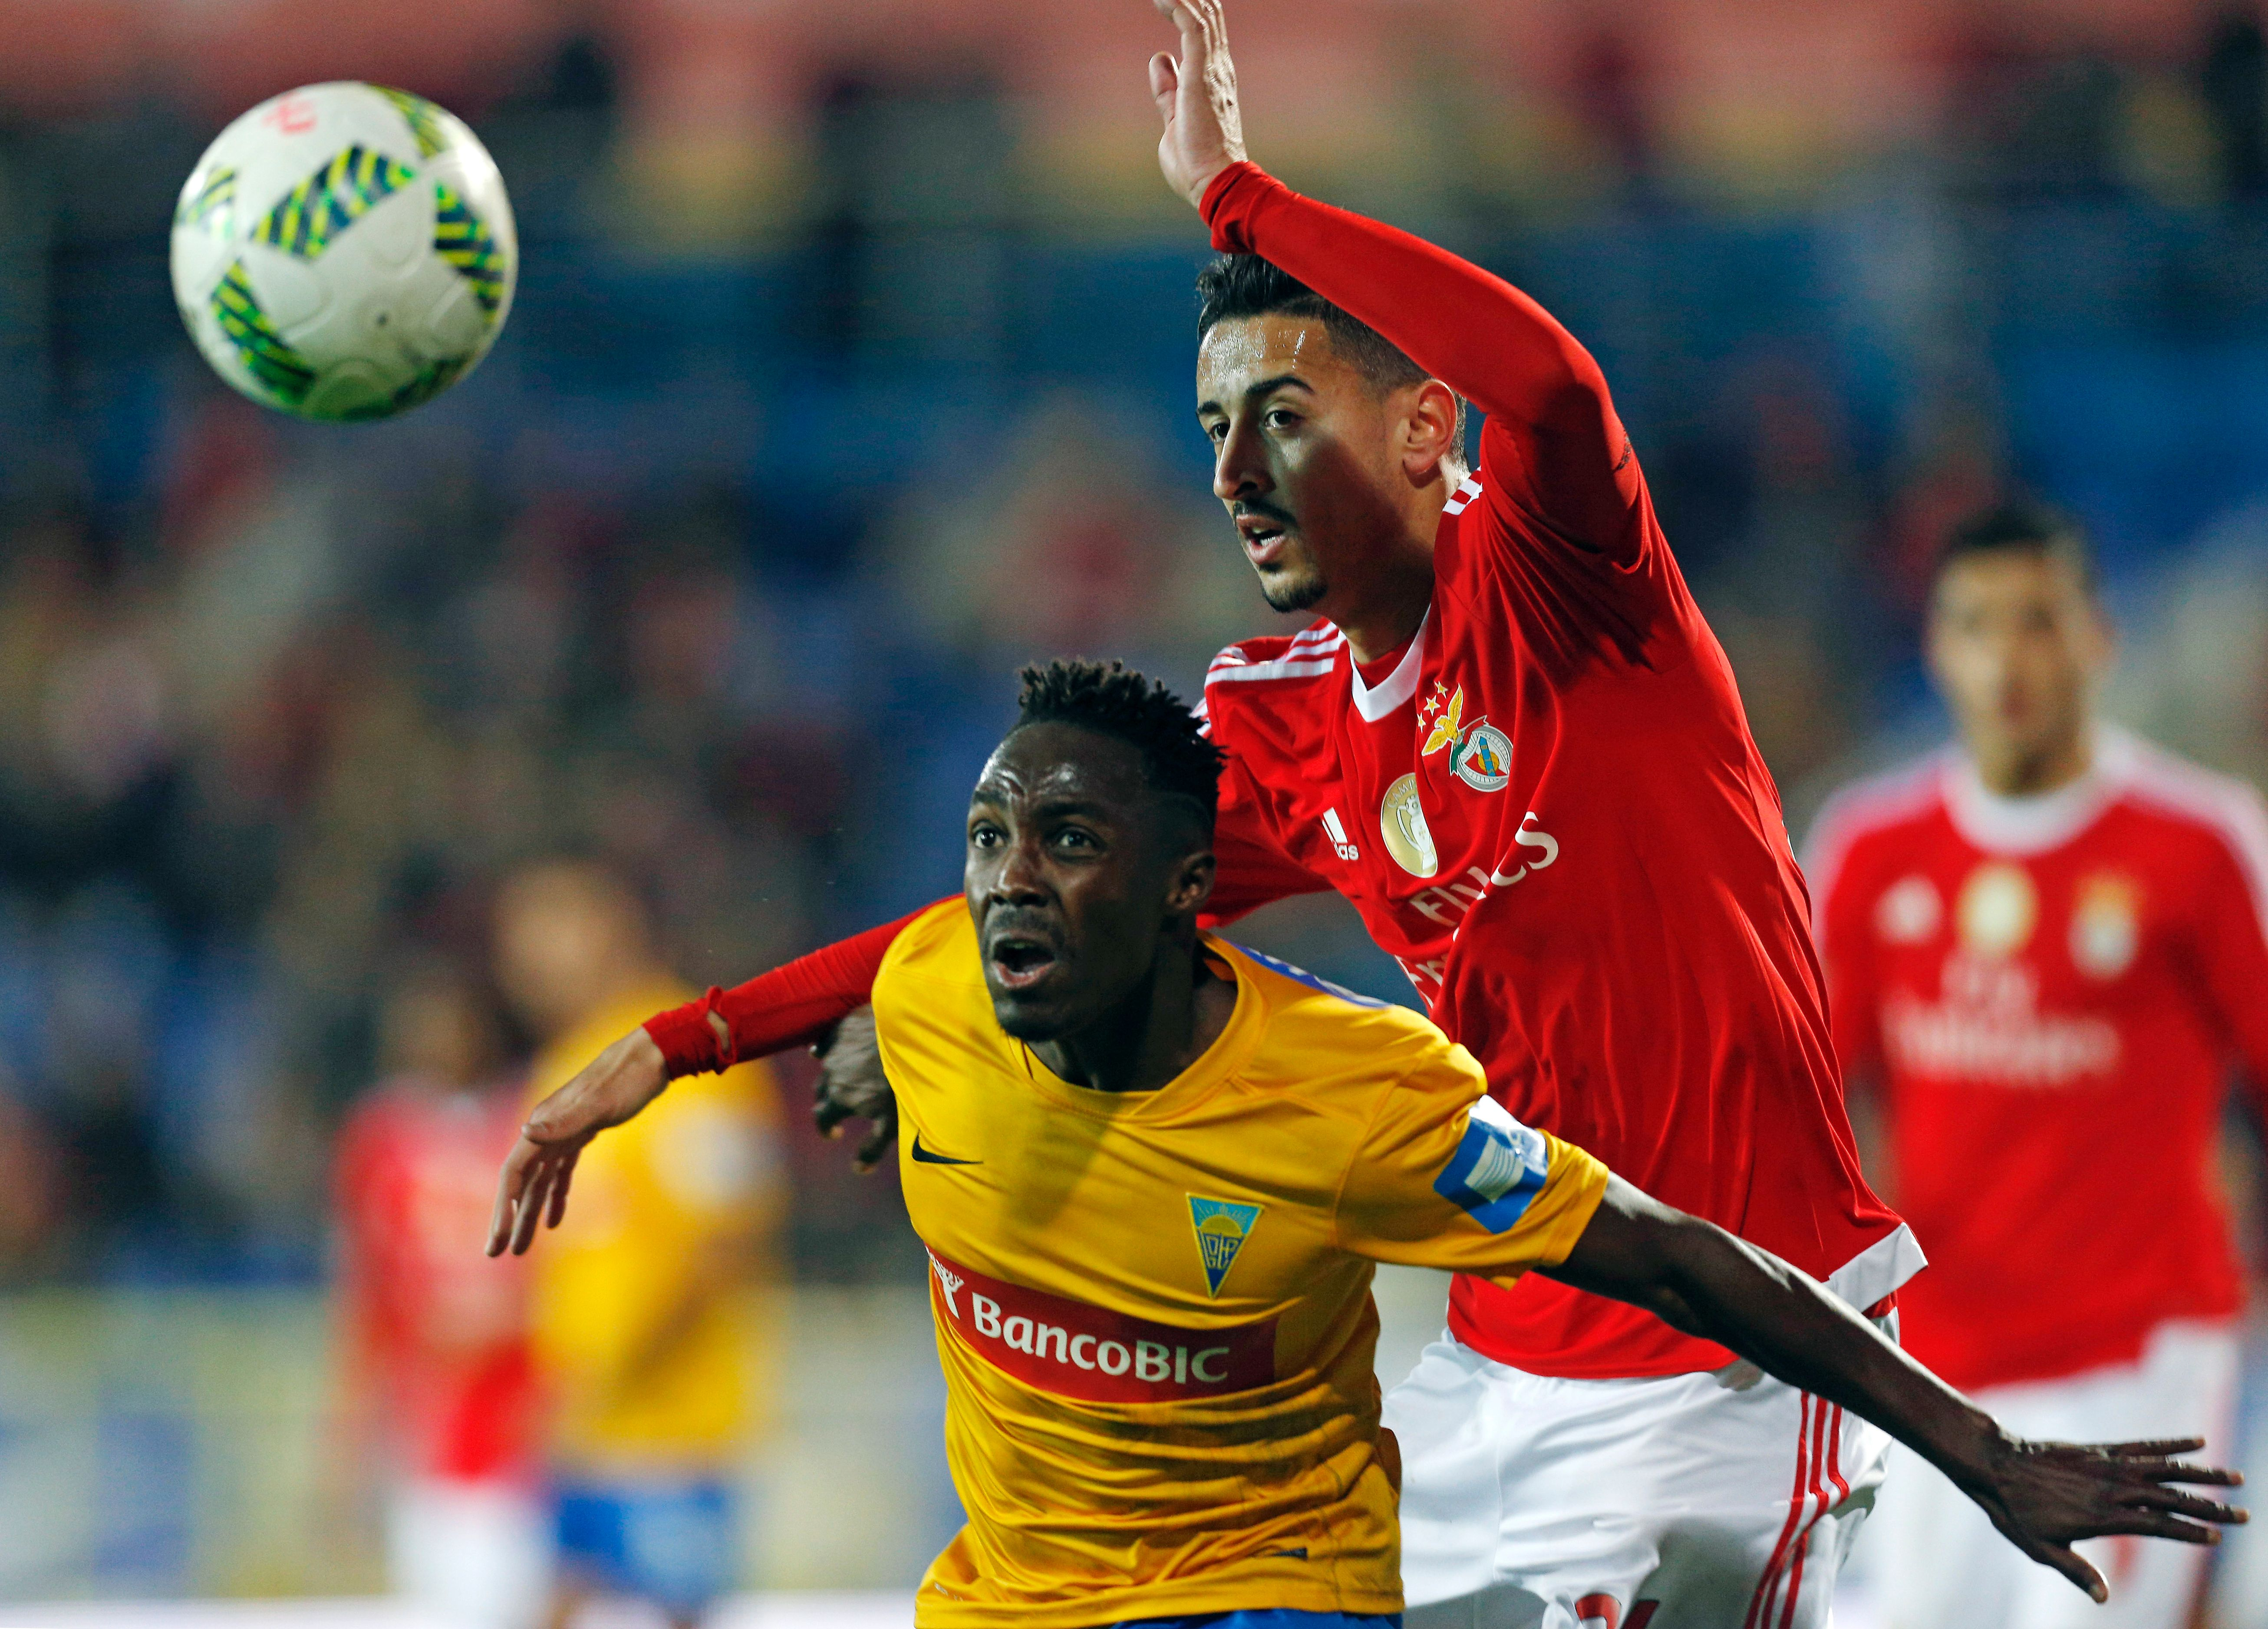 Gerso Fernandes, Sporting Kansas City